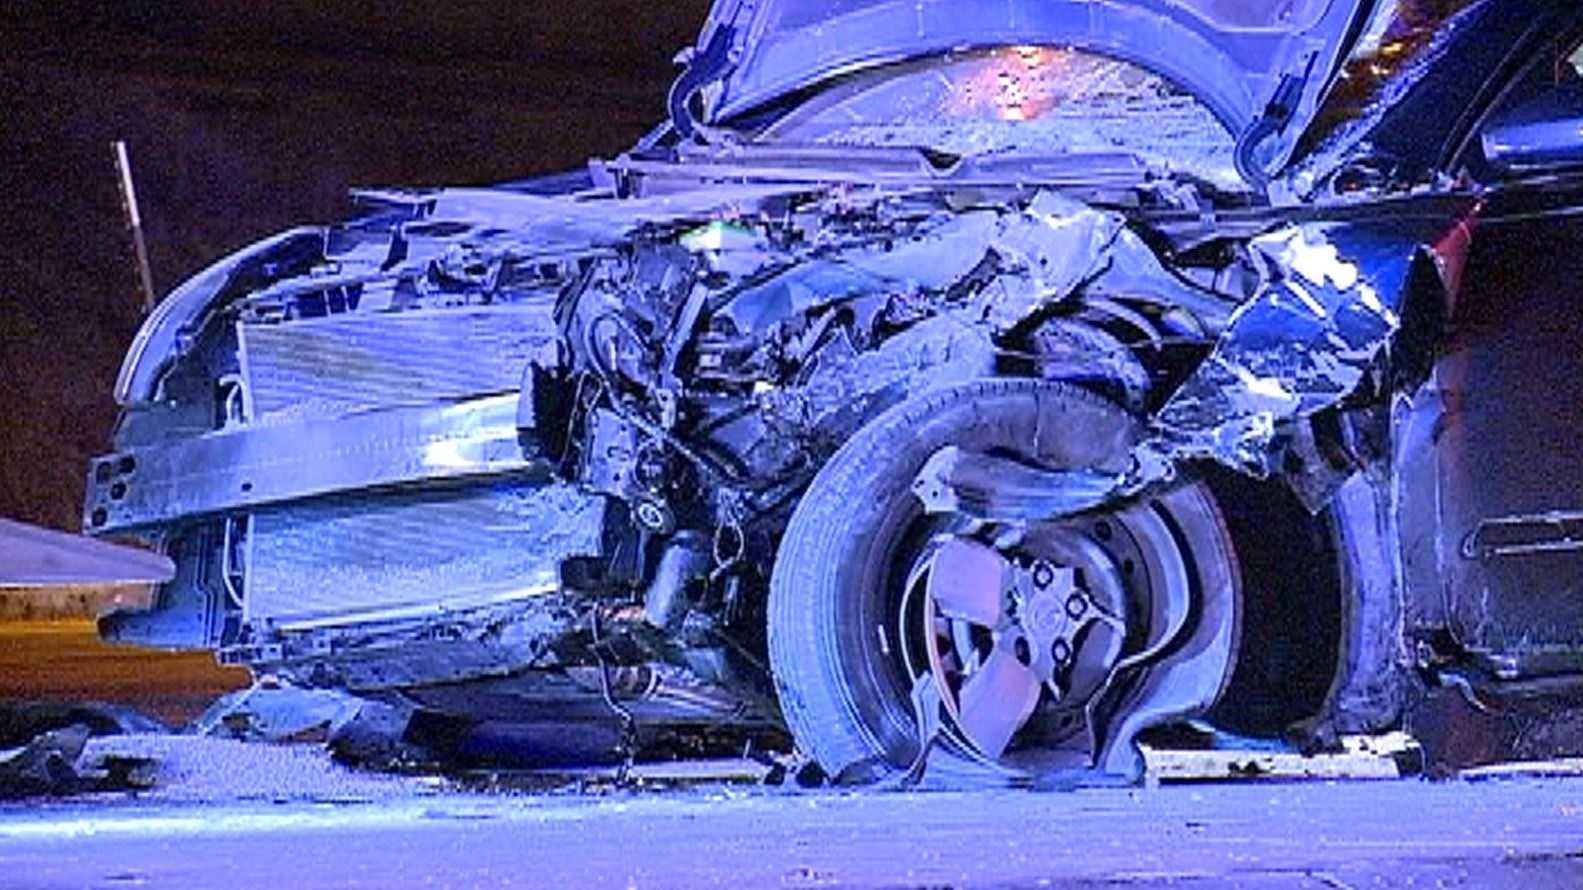 interstate80-hwy370-crash.JPG